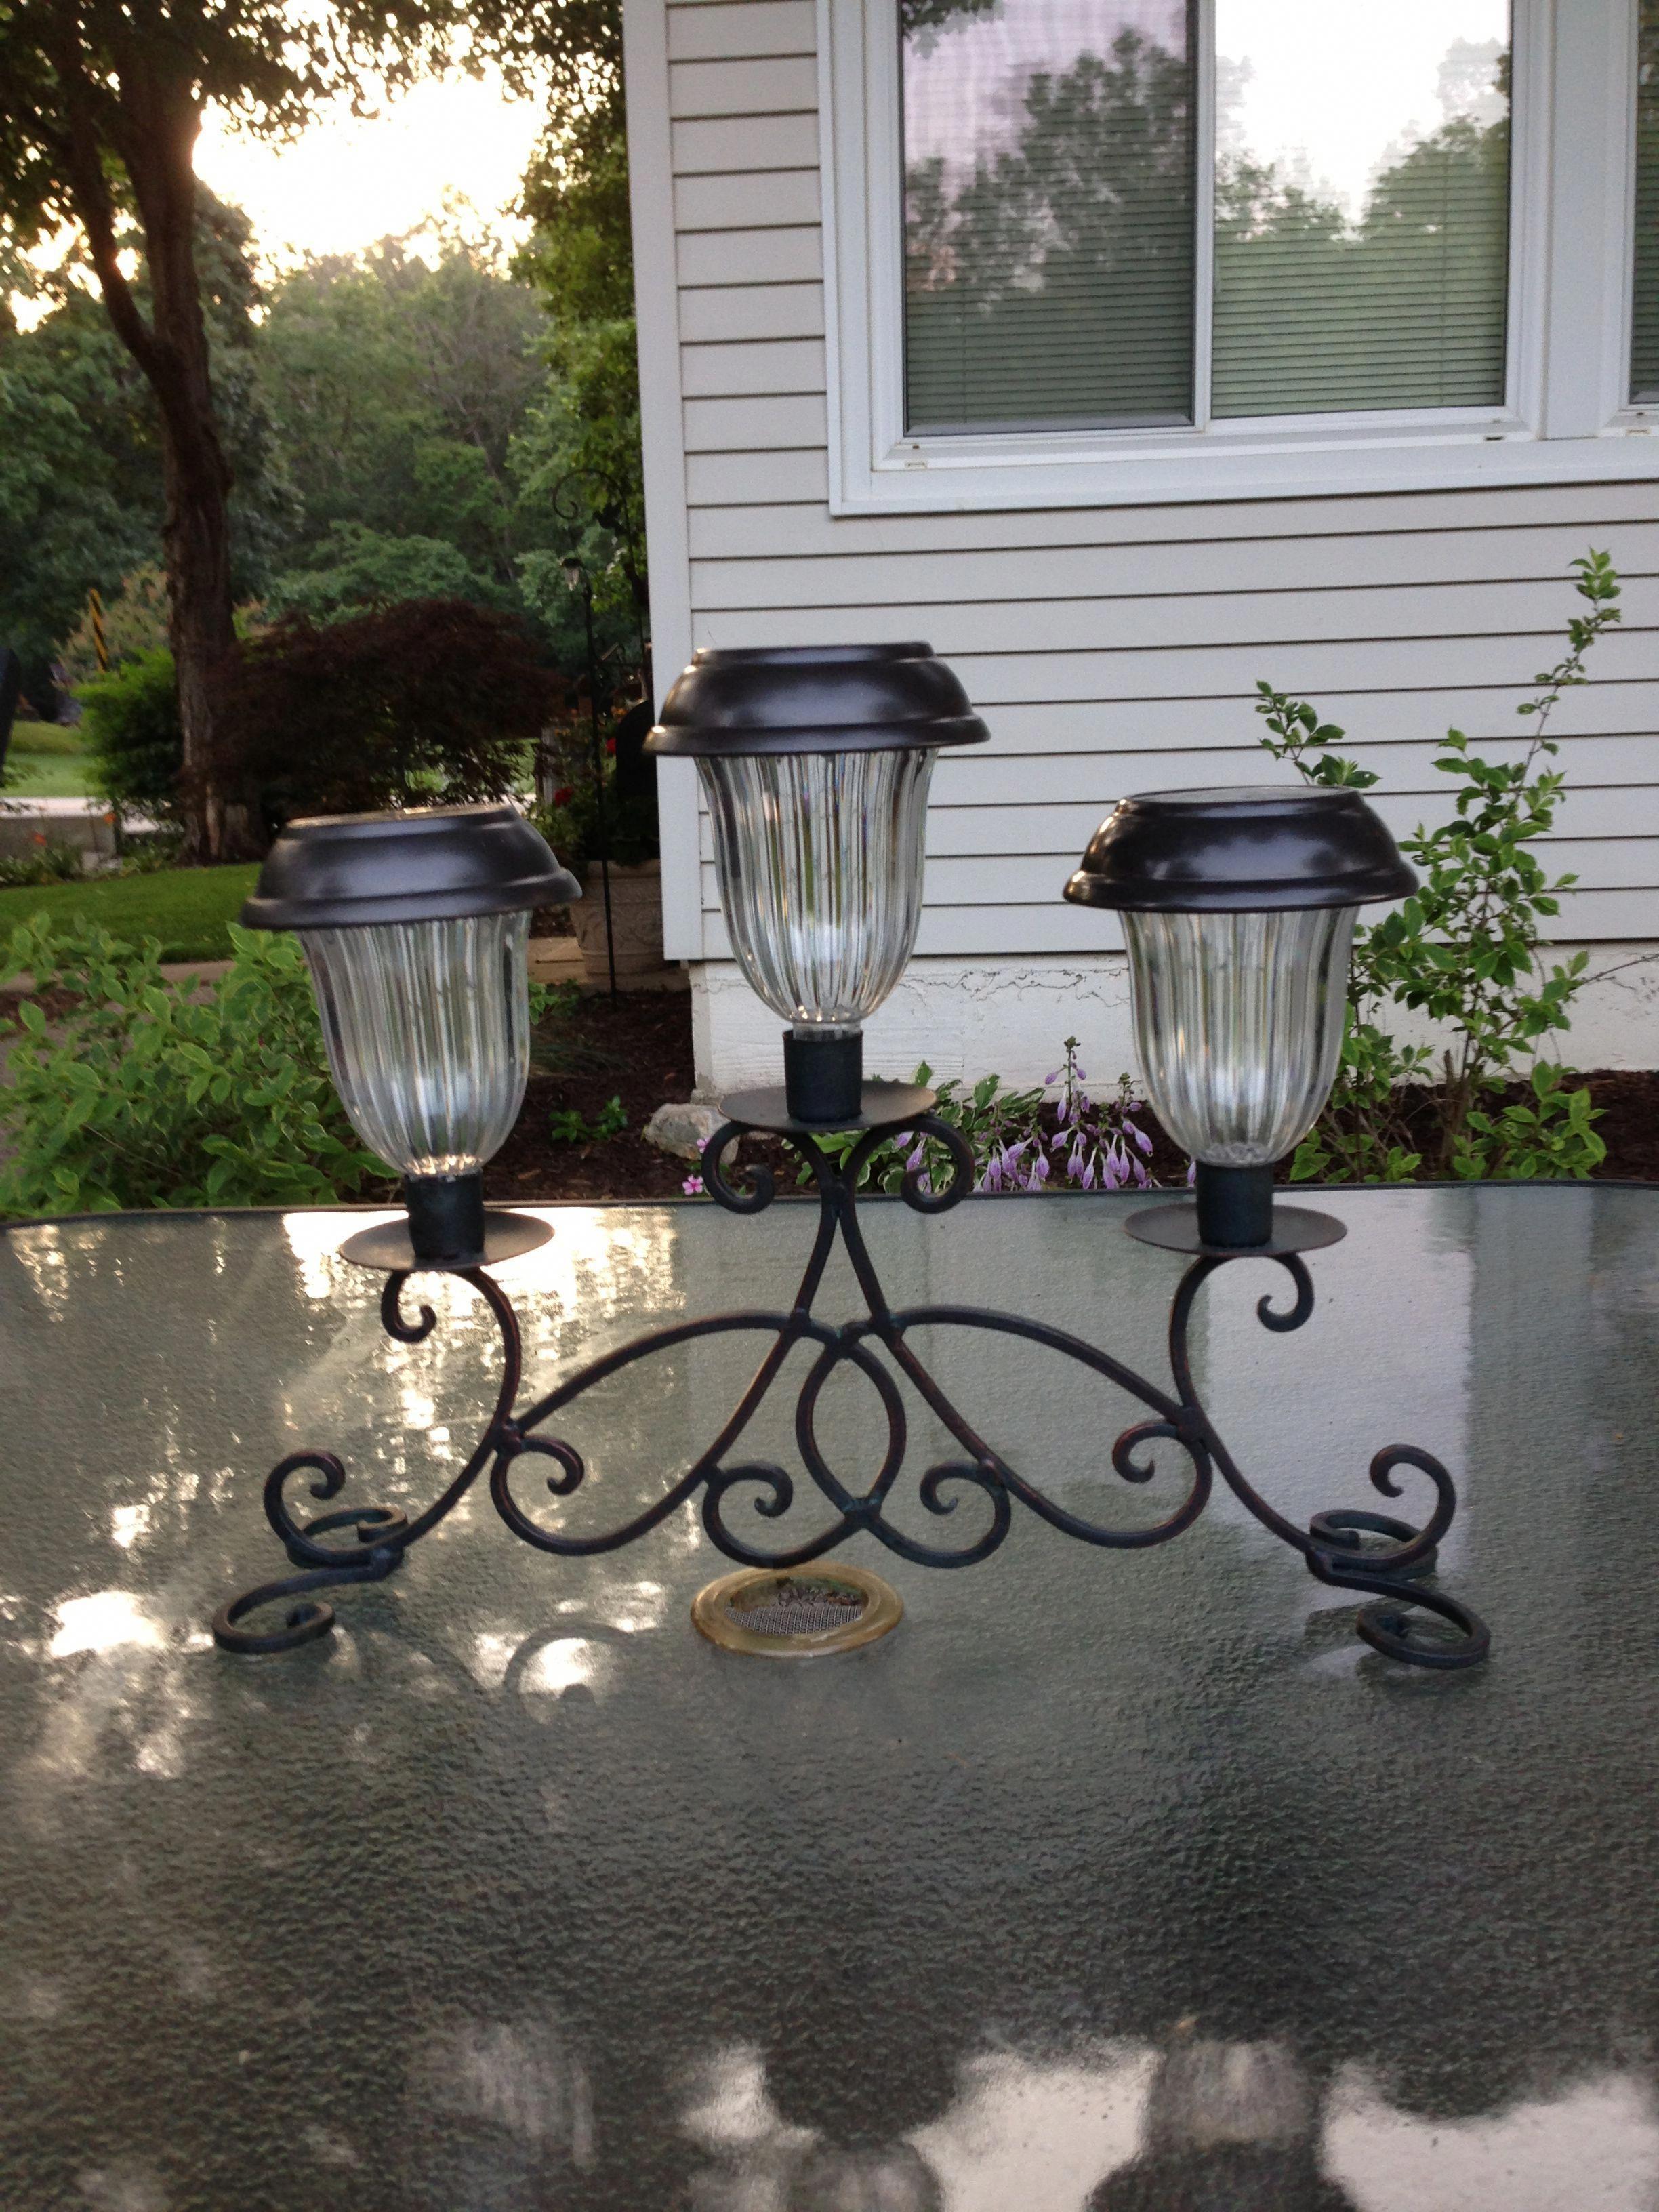 Go Green With Solar Garden Lights Diy Outdoor Lighting Solar Lights Garden Solar Light Crafts